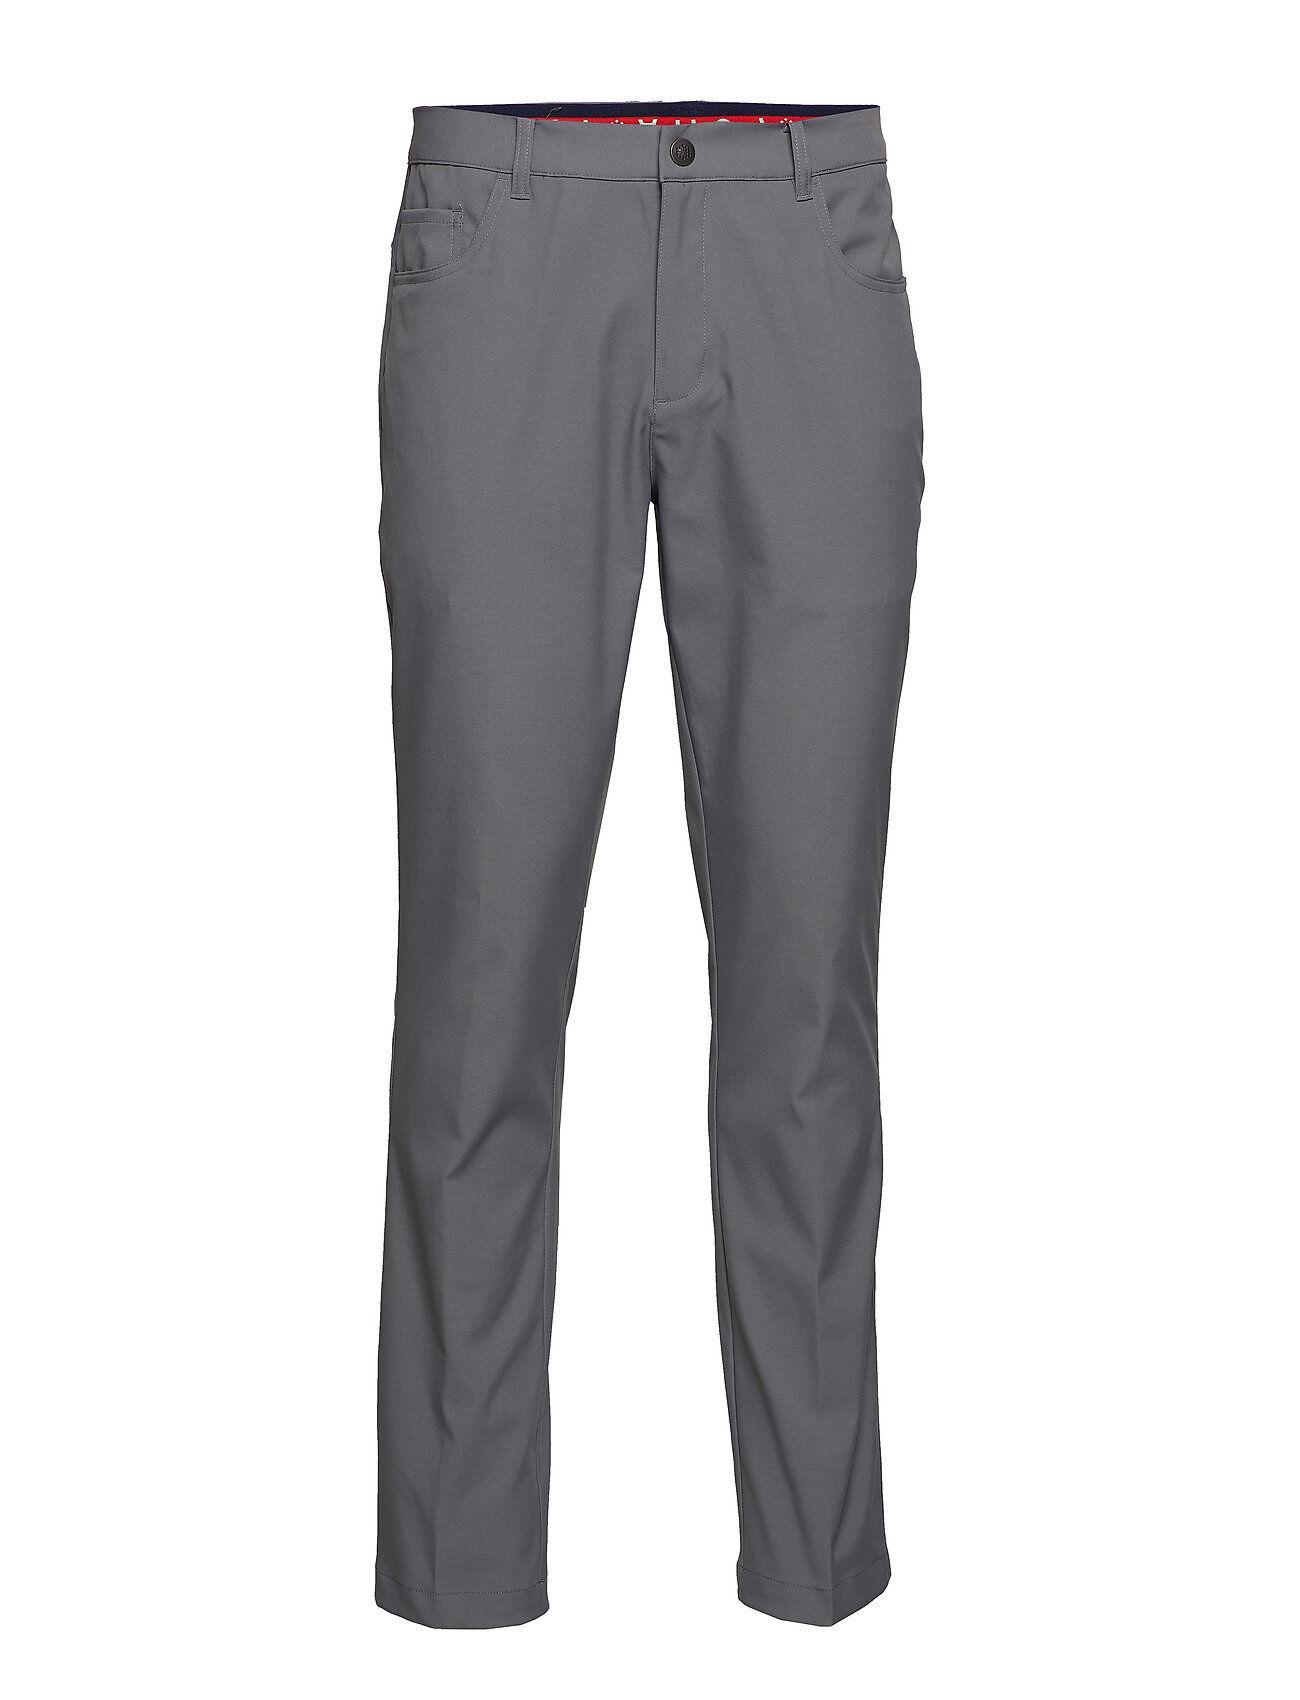 PUMA Golf Jackpot 5 Pocket Pant Sport Pants Harmaa PUMA Golf